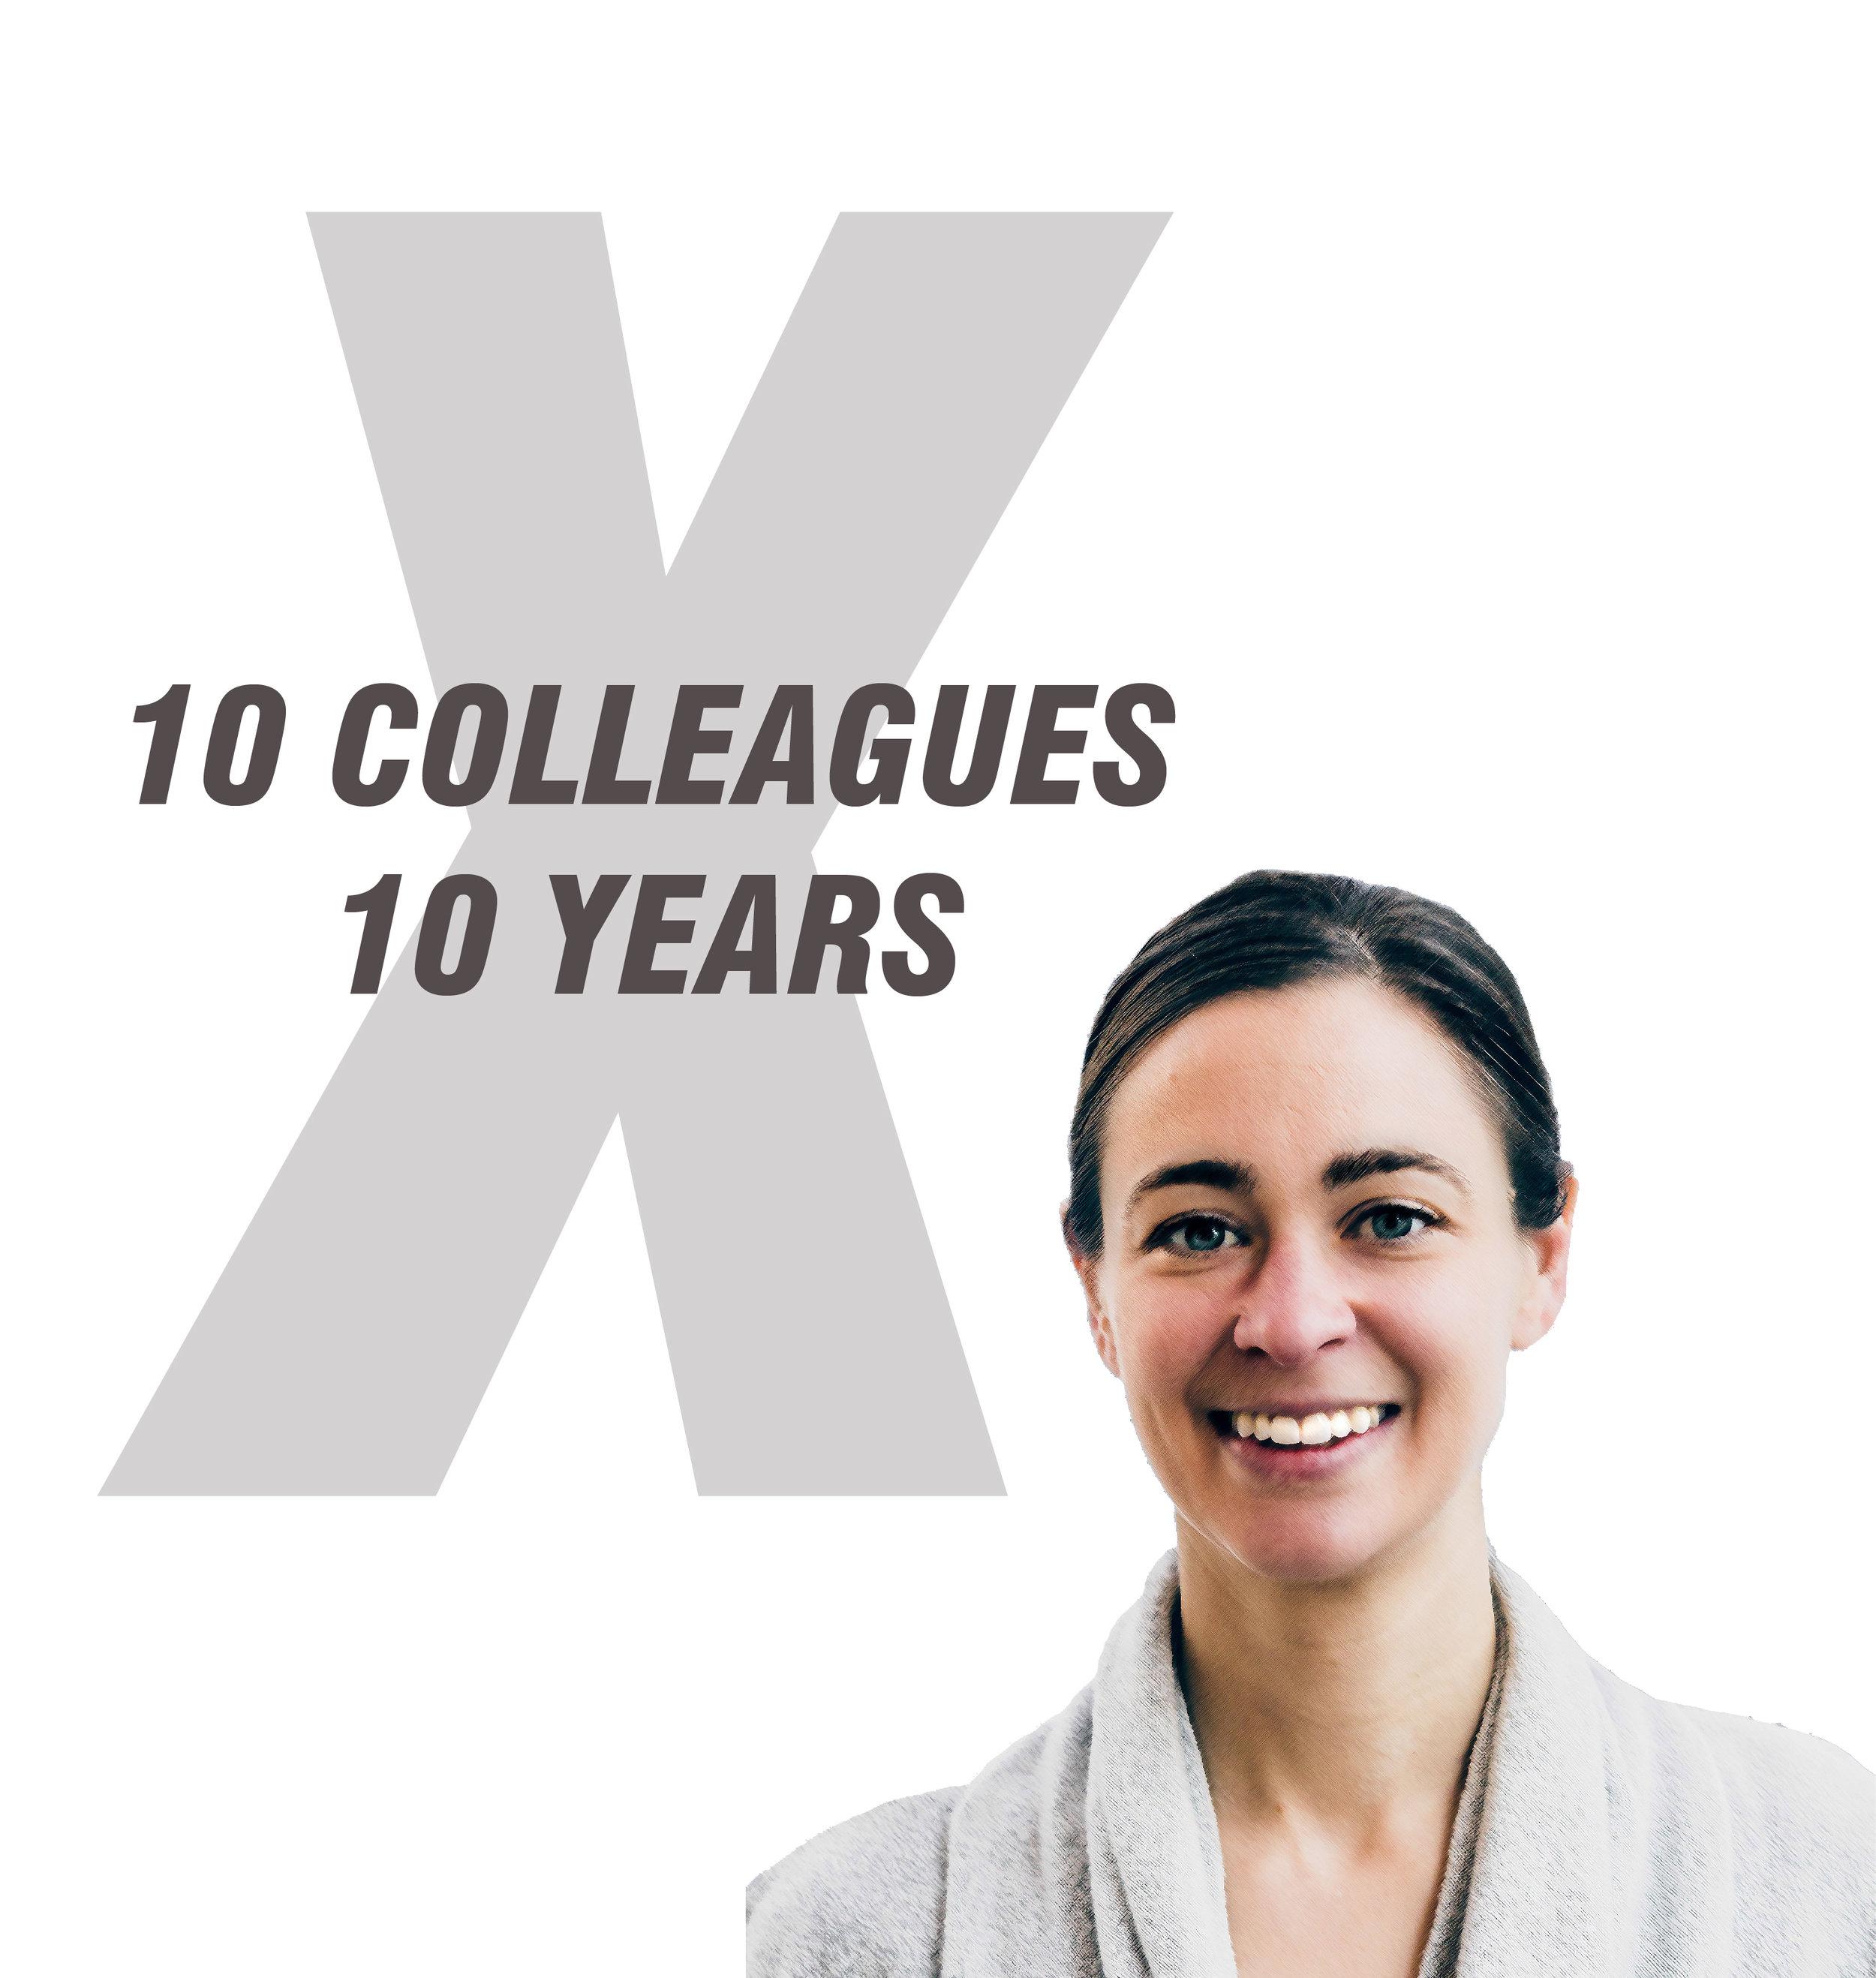 10 Colleagues 10 years logo.jpg